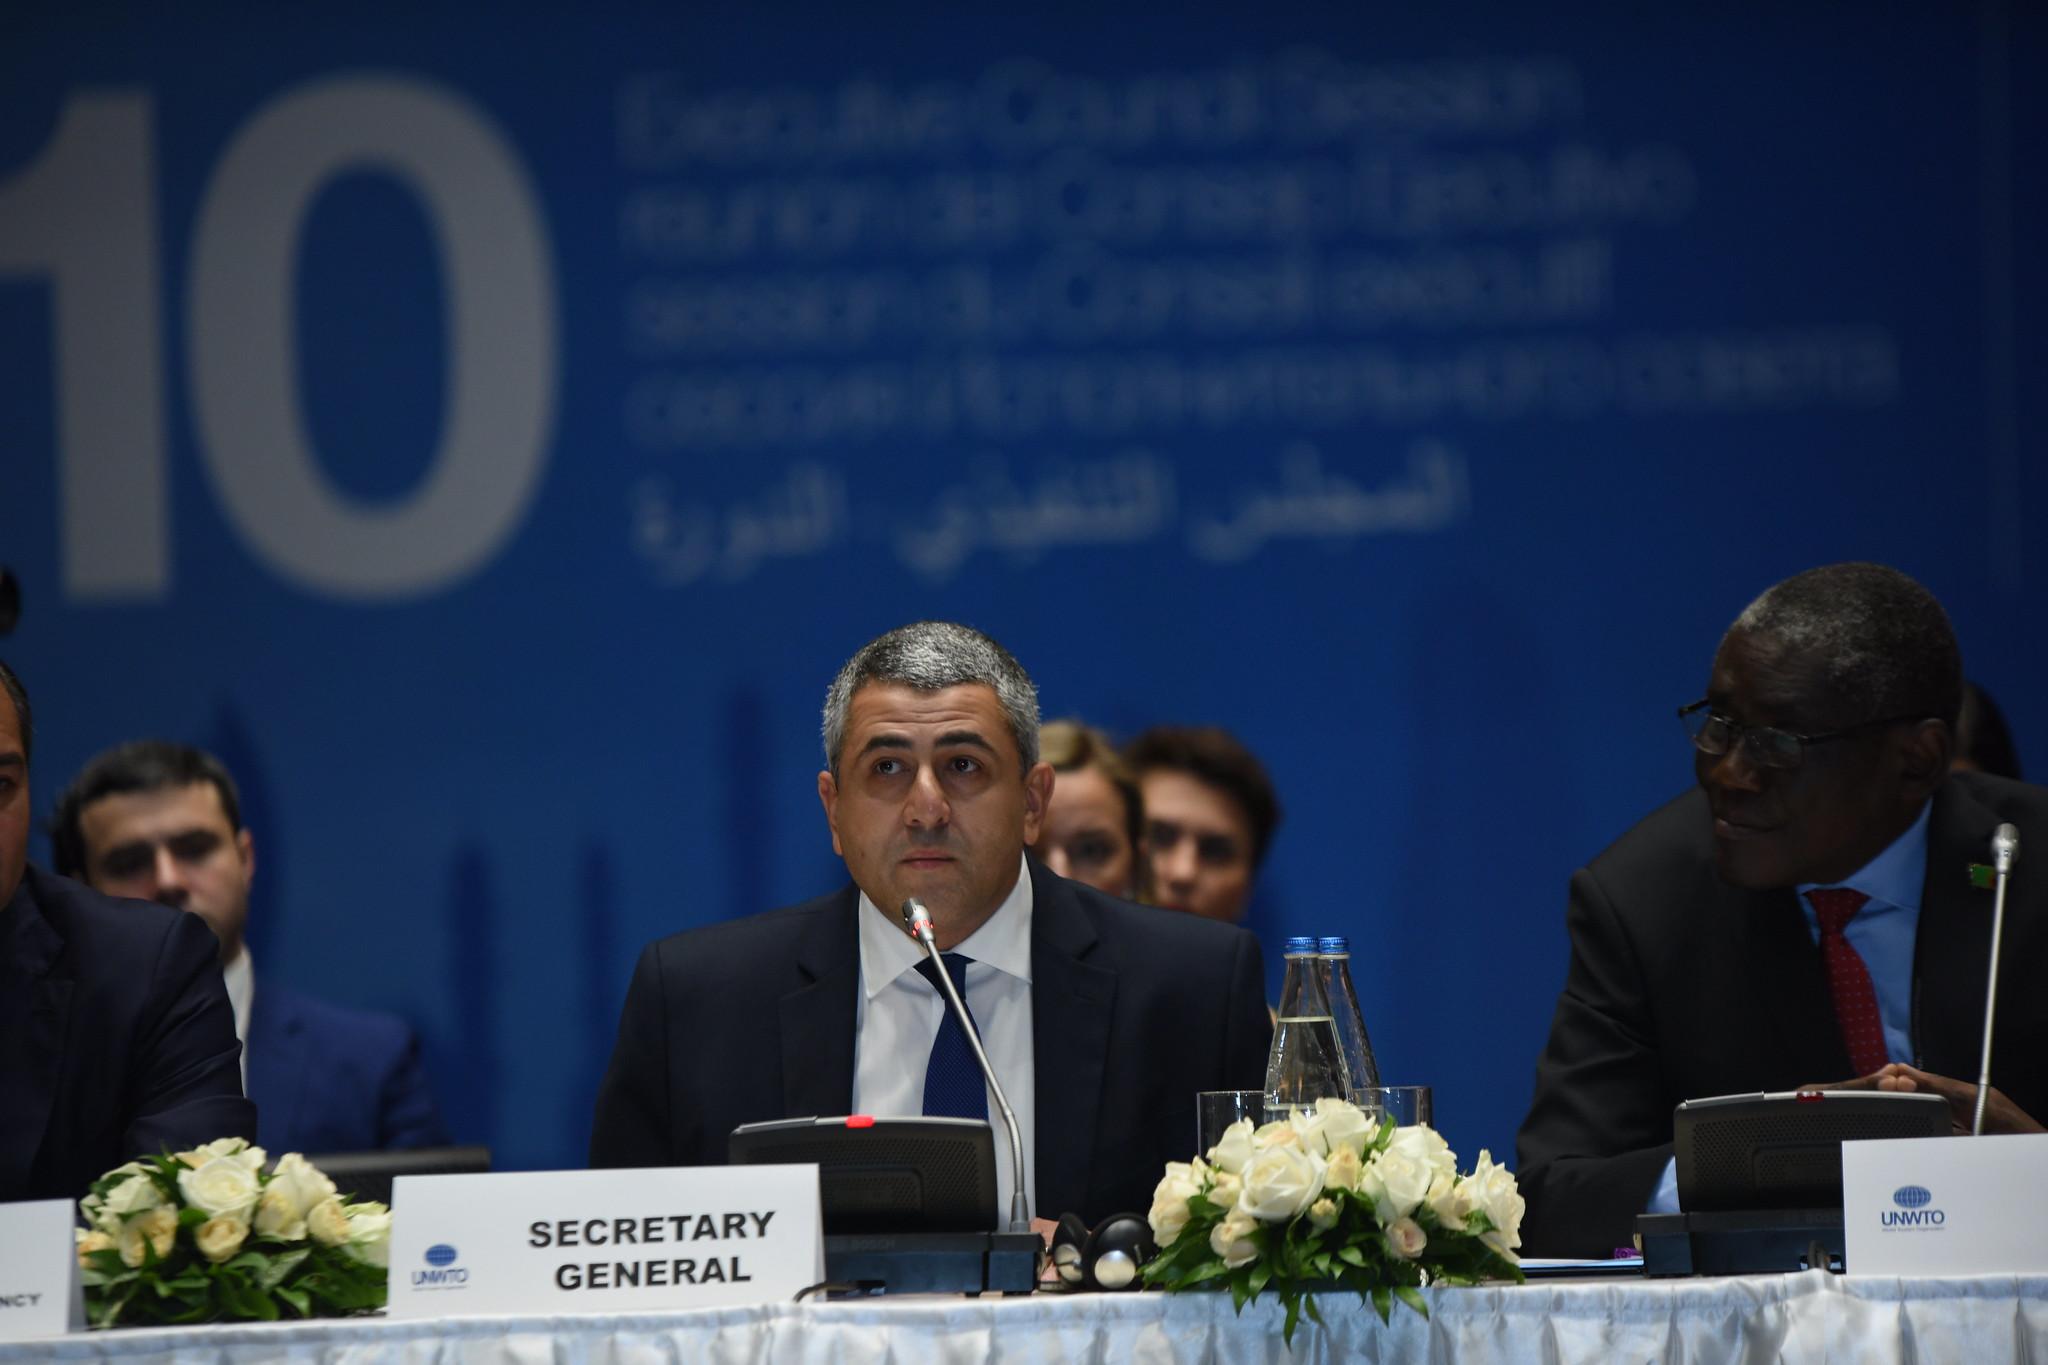 UNWTO Executive Council endorses Secretary General's Agenda for Africa